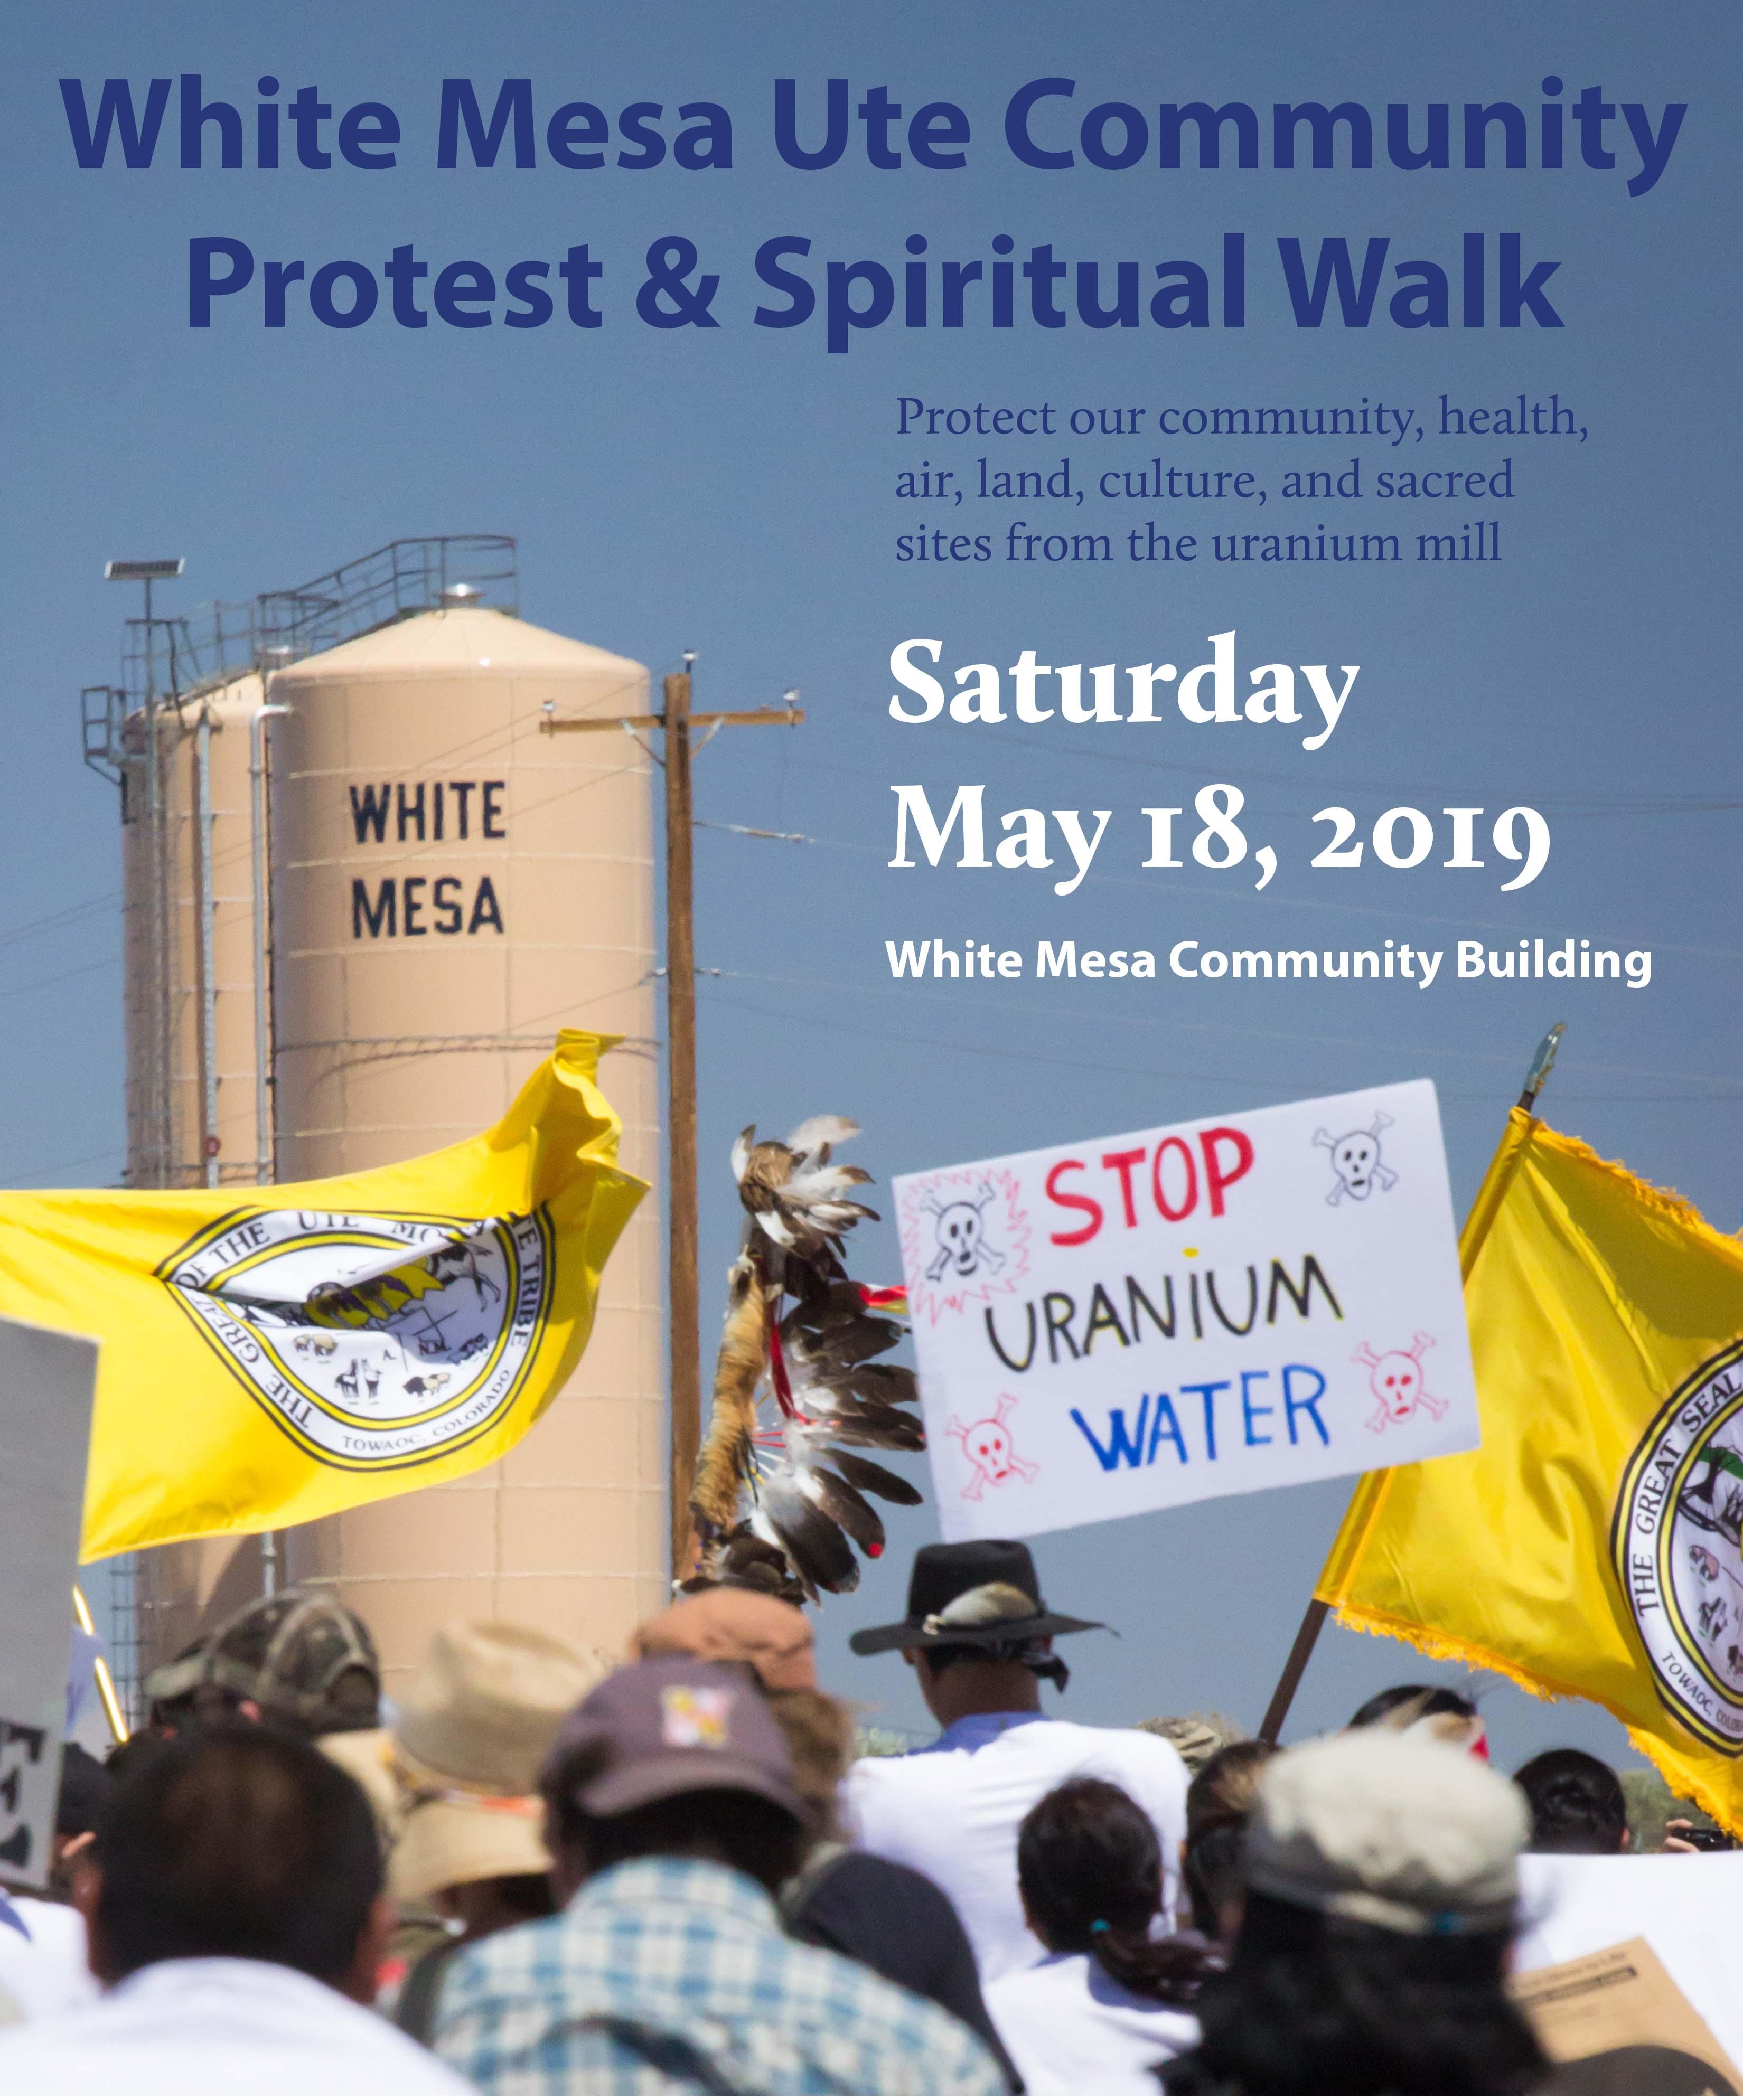 Annual White Mesa Ute Spiritual Walk and Protest against Energy Fuels' Uranium Mill.